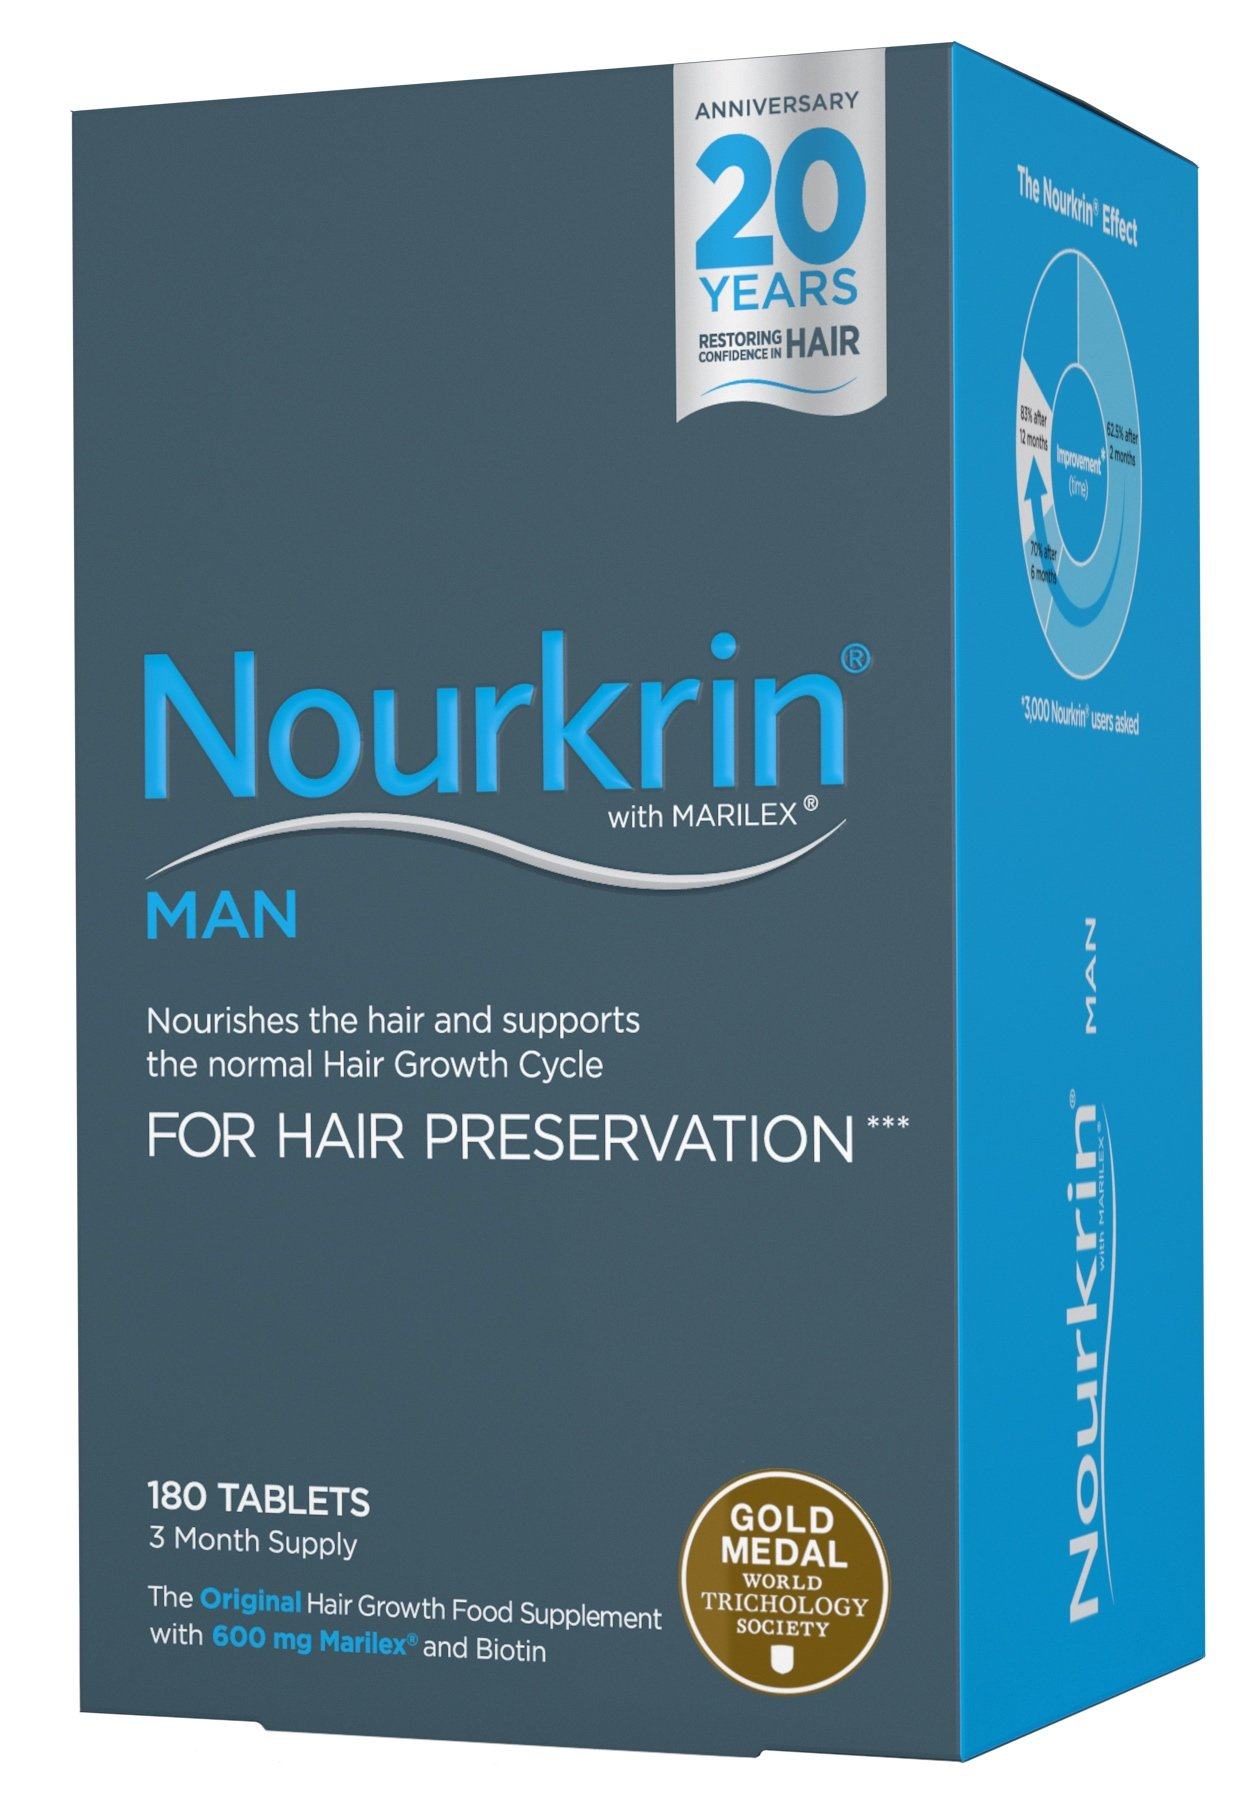 Nourkrin Man Starter Pack 180 tablets (3 months) by Nourkrin (Image #1)